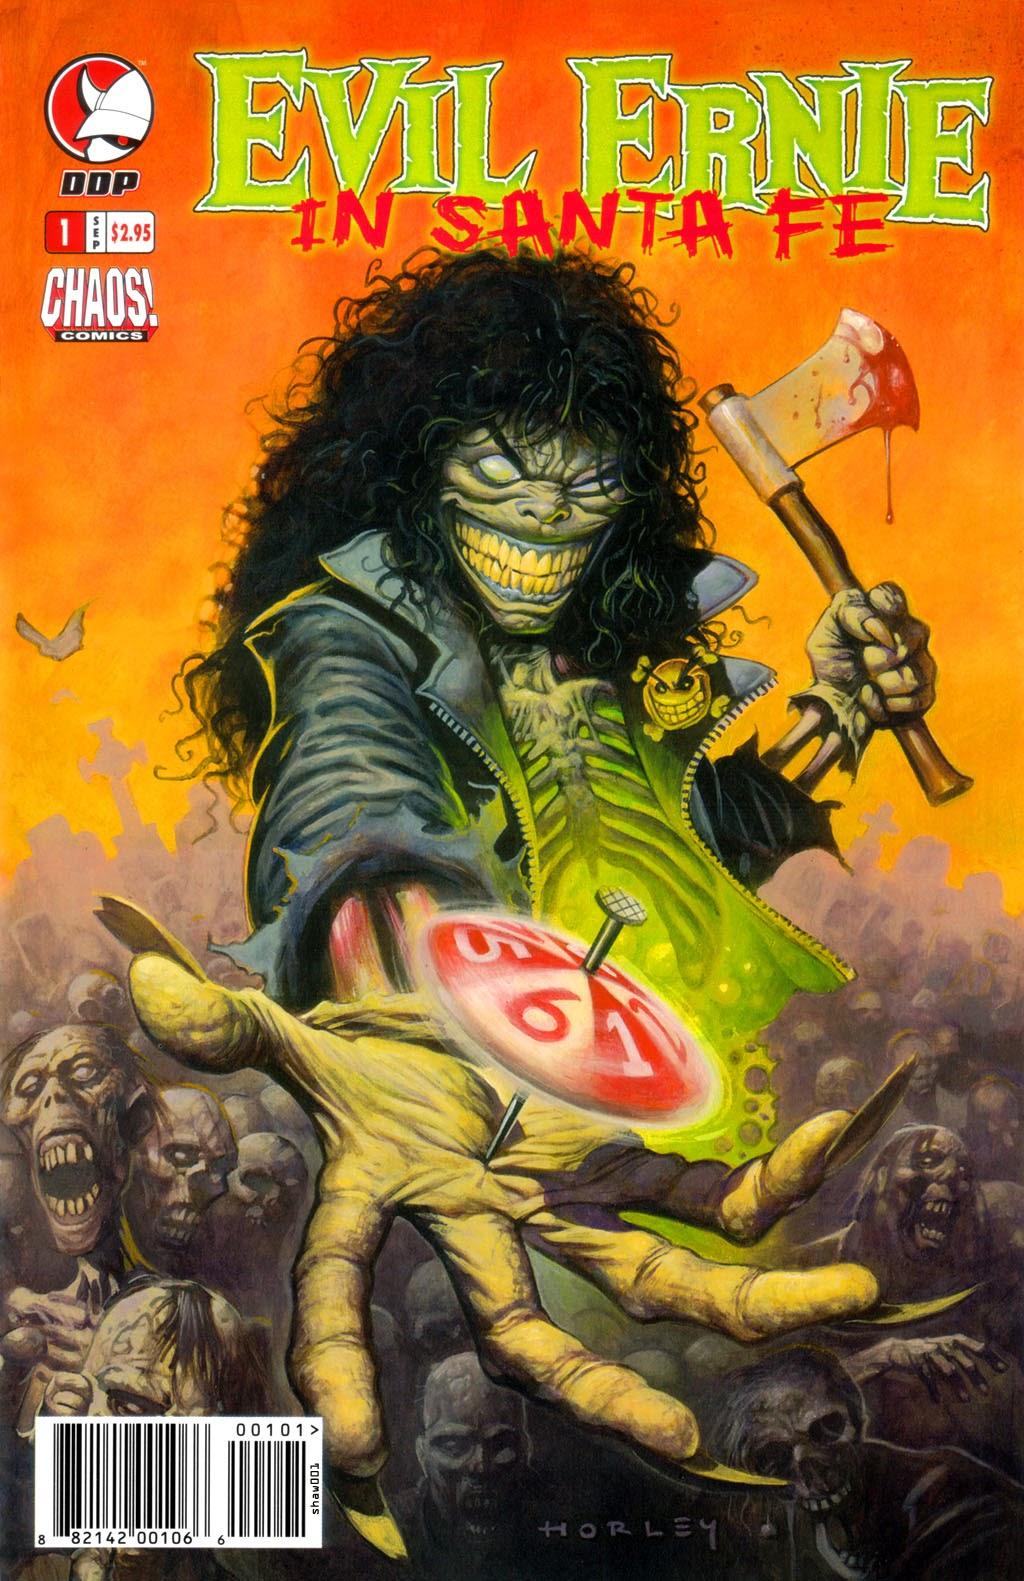 Read online Evil Ernie in Santa Fe comic -  Issue #1 - 1